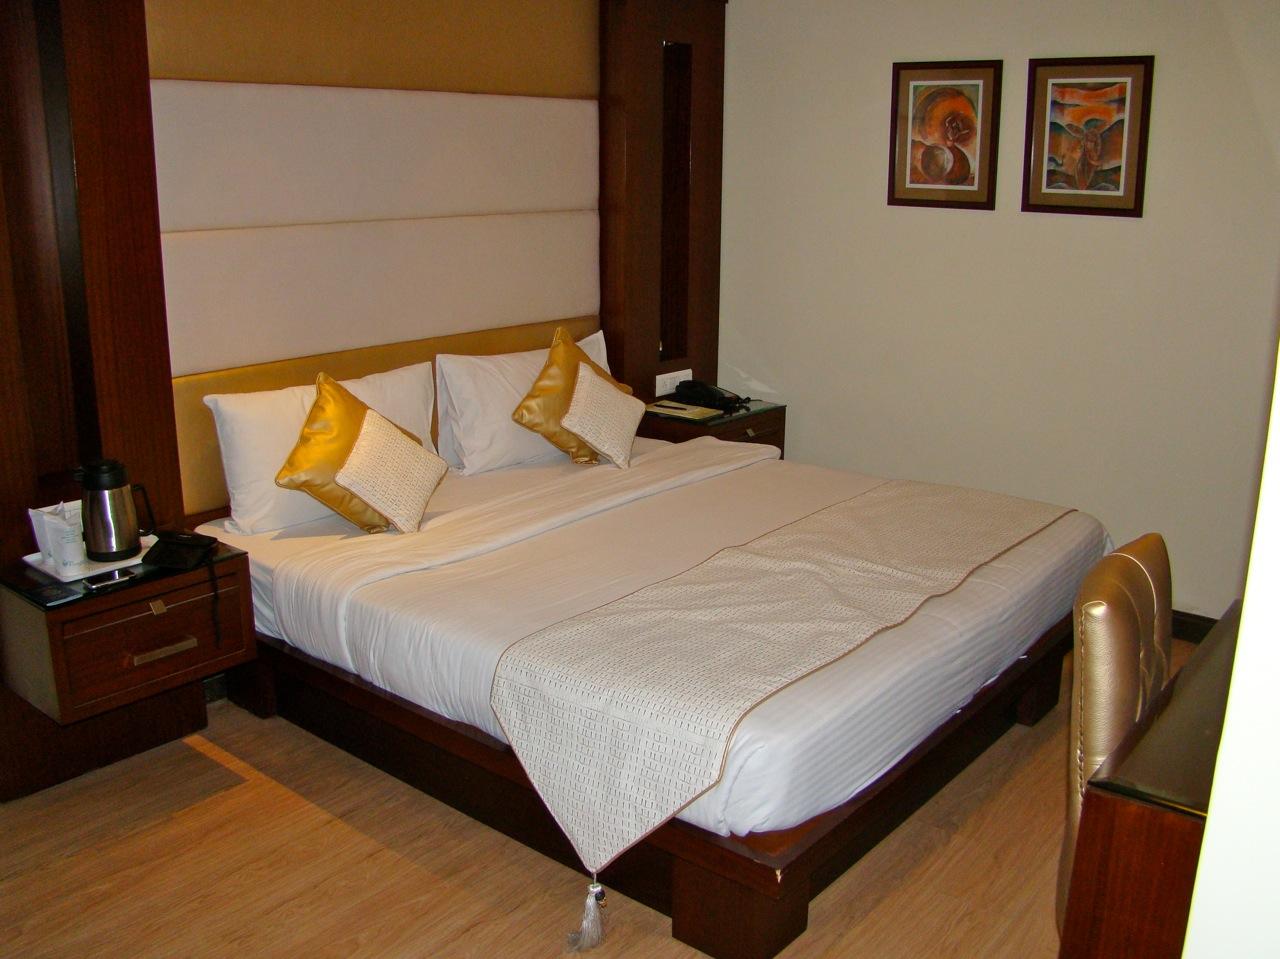 Hotel Royal Shades (Murugeshpalya) in bengaluru